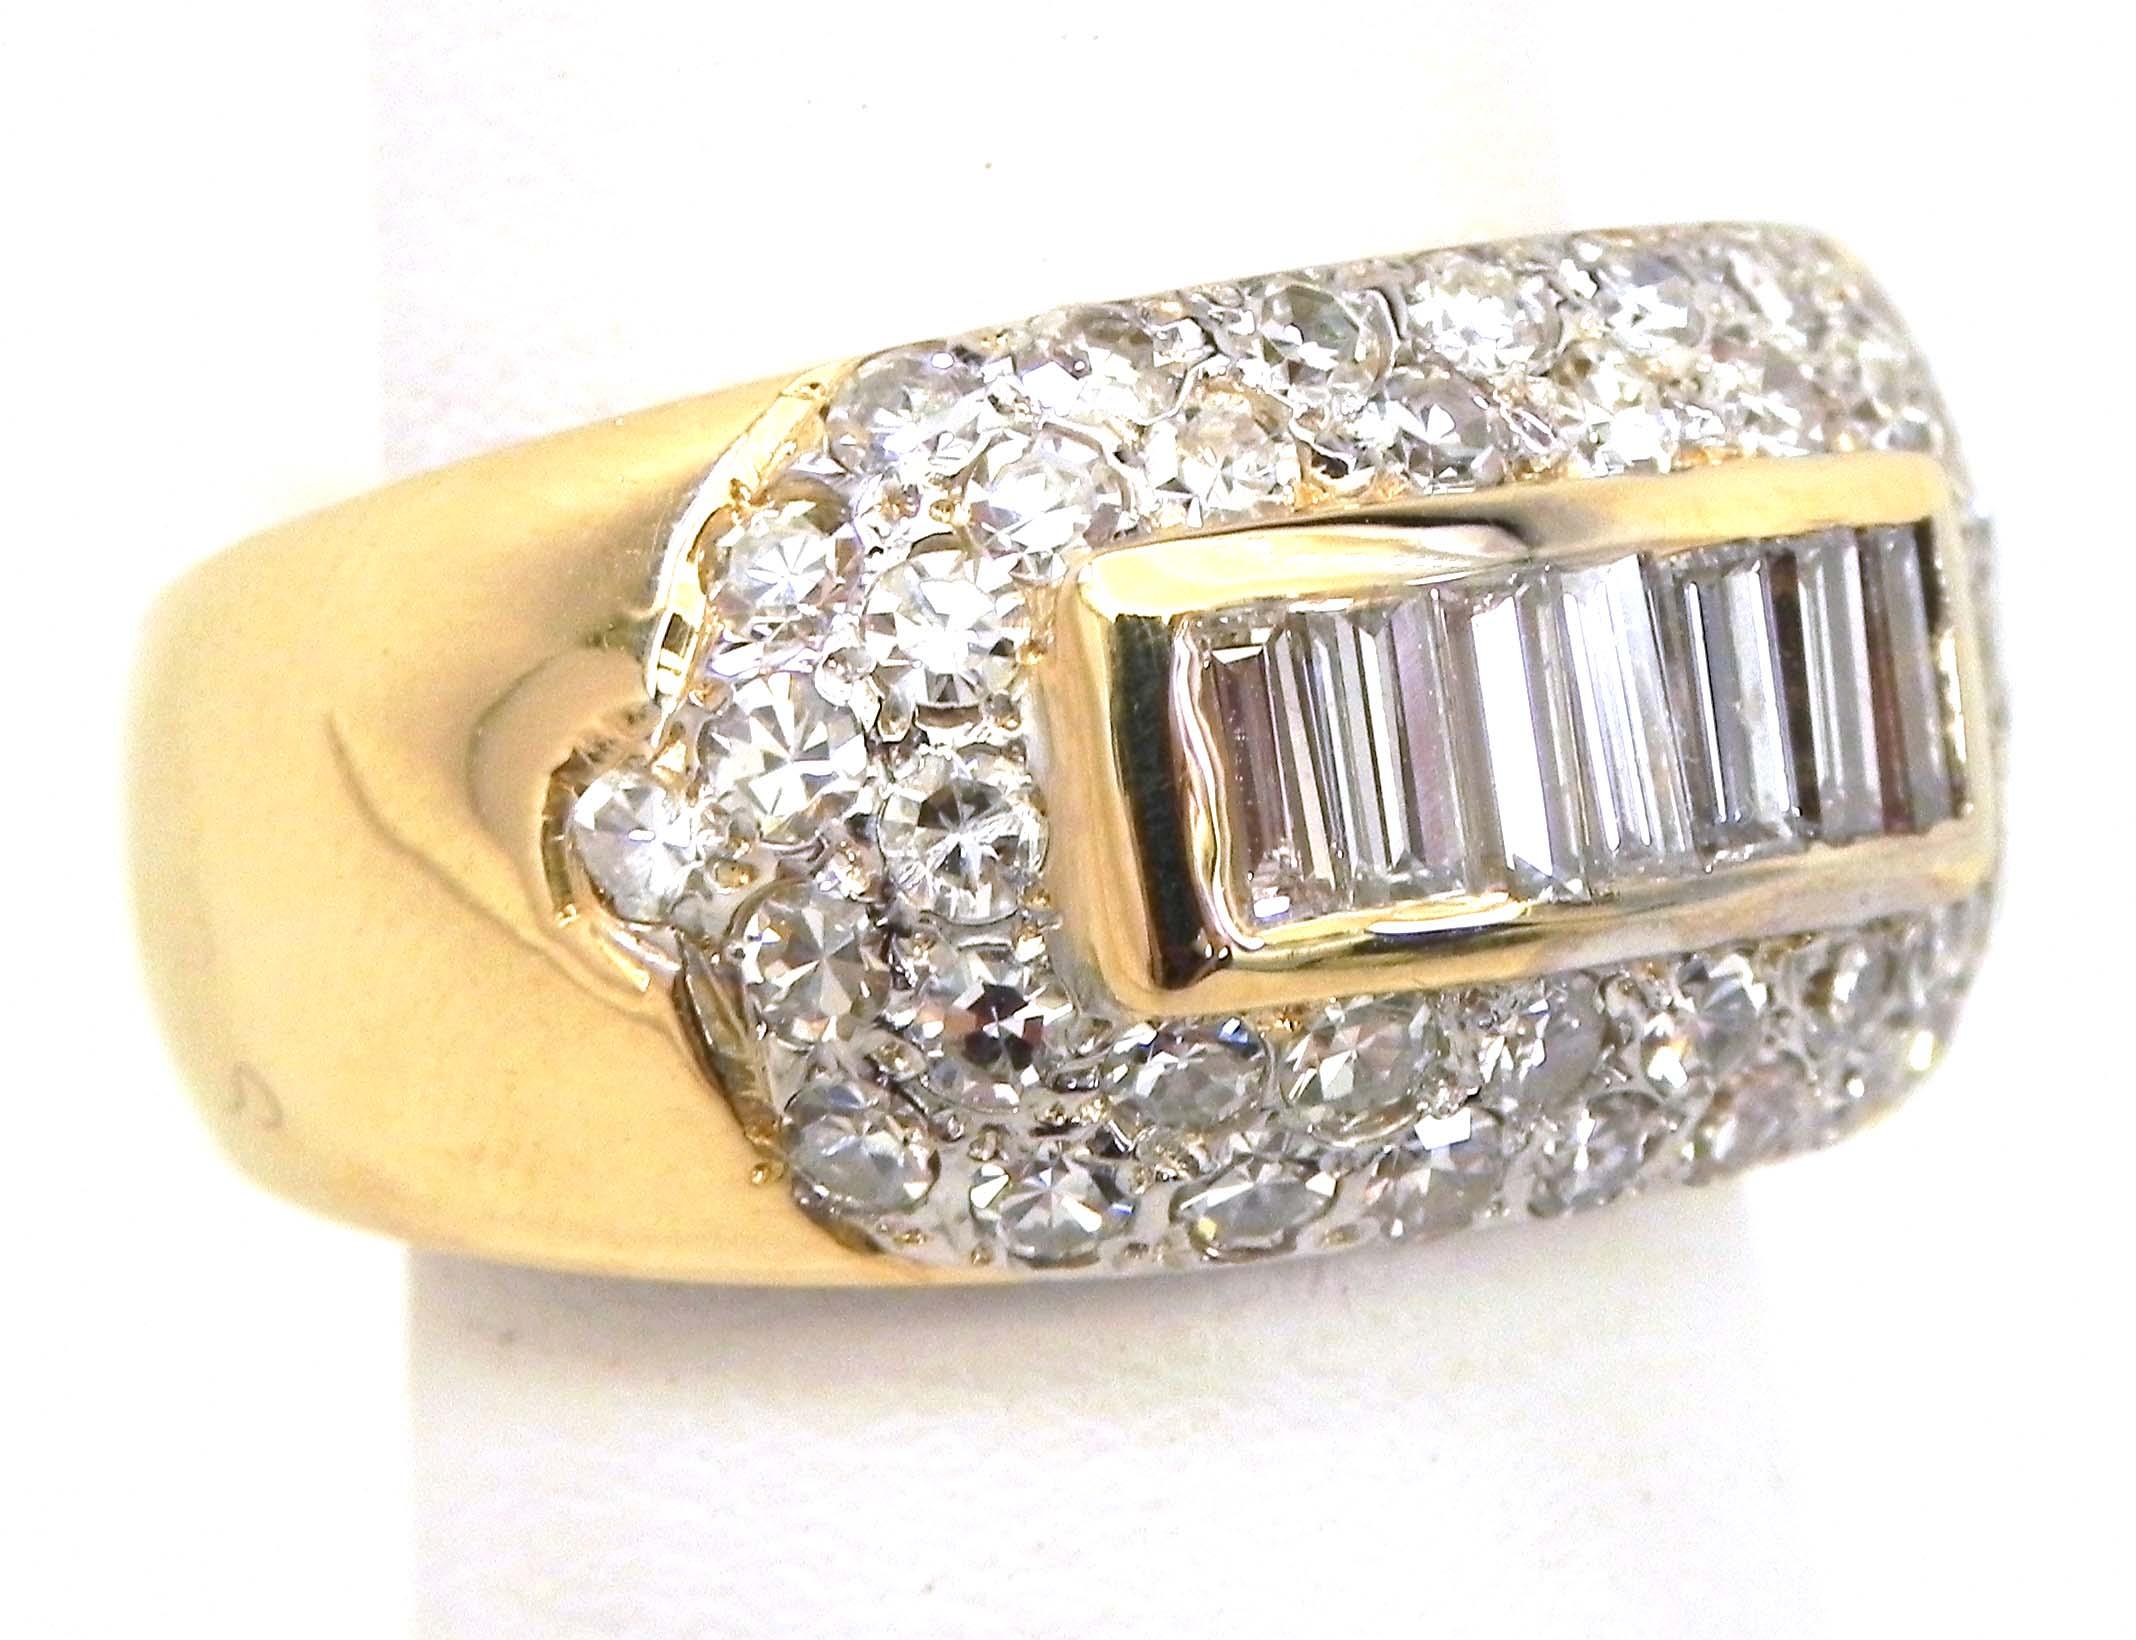 La s 14k Yellow Gold Round & Baguette Diamonds Band Ring